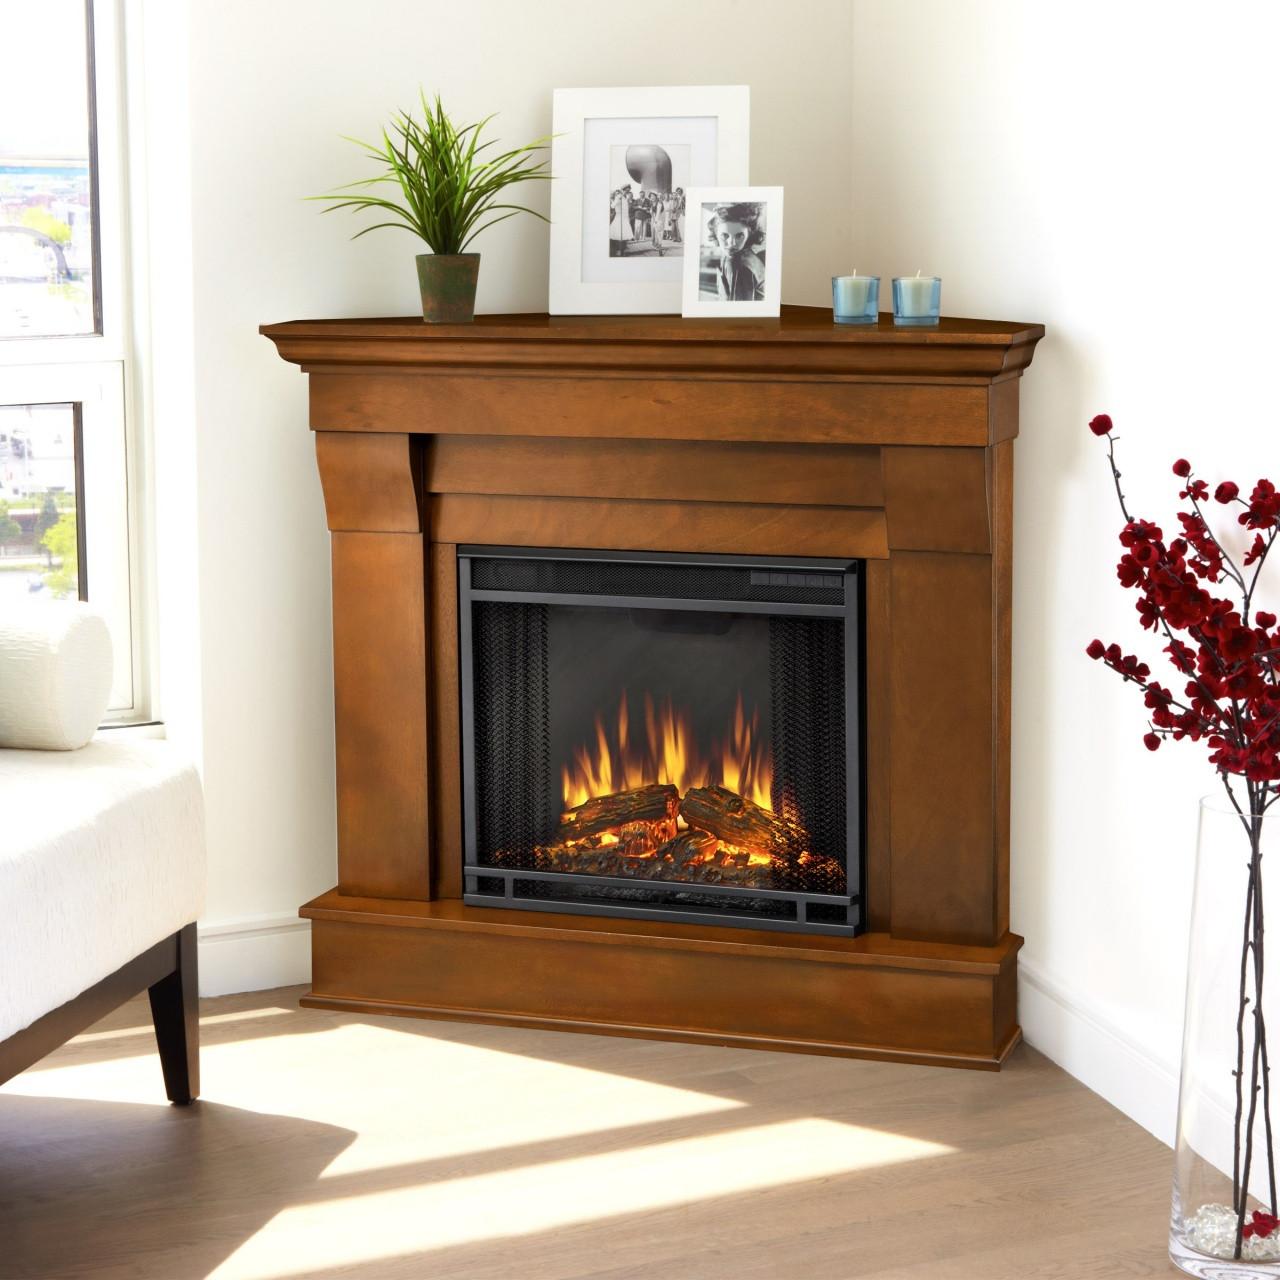 Electric Fireplace Tv Stand Menards  Menards Electric Fireplace Tv Stands – FIREPLACE IDEAS